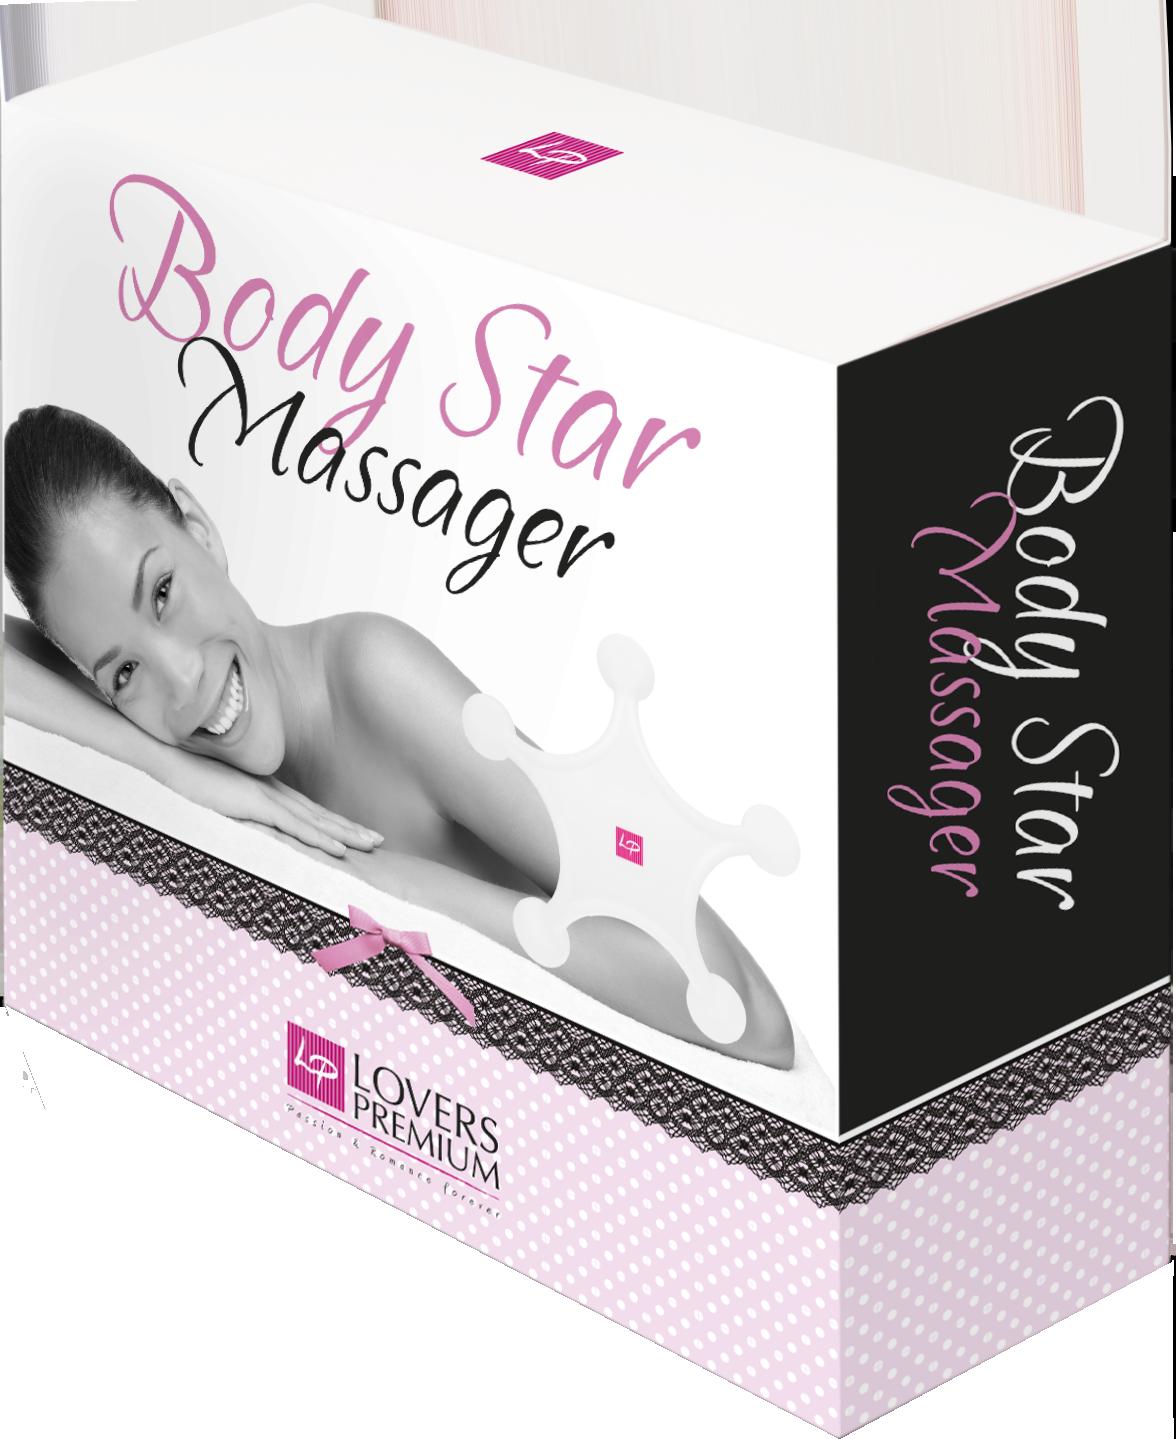 Body Star Massager - massagiatore corpo